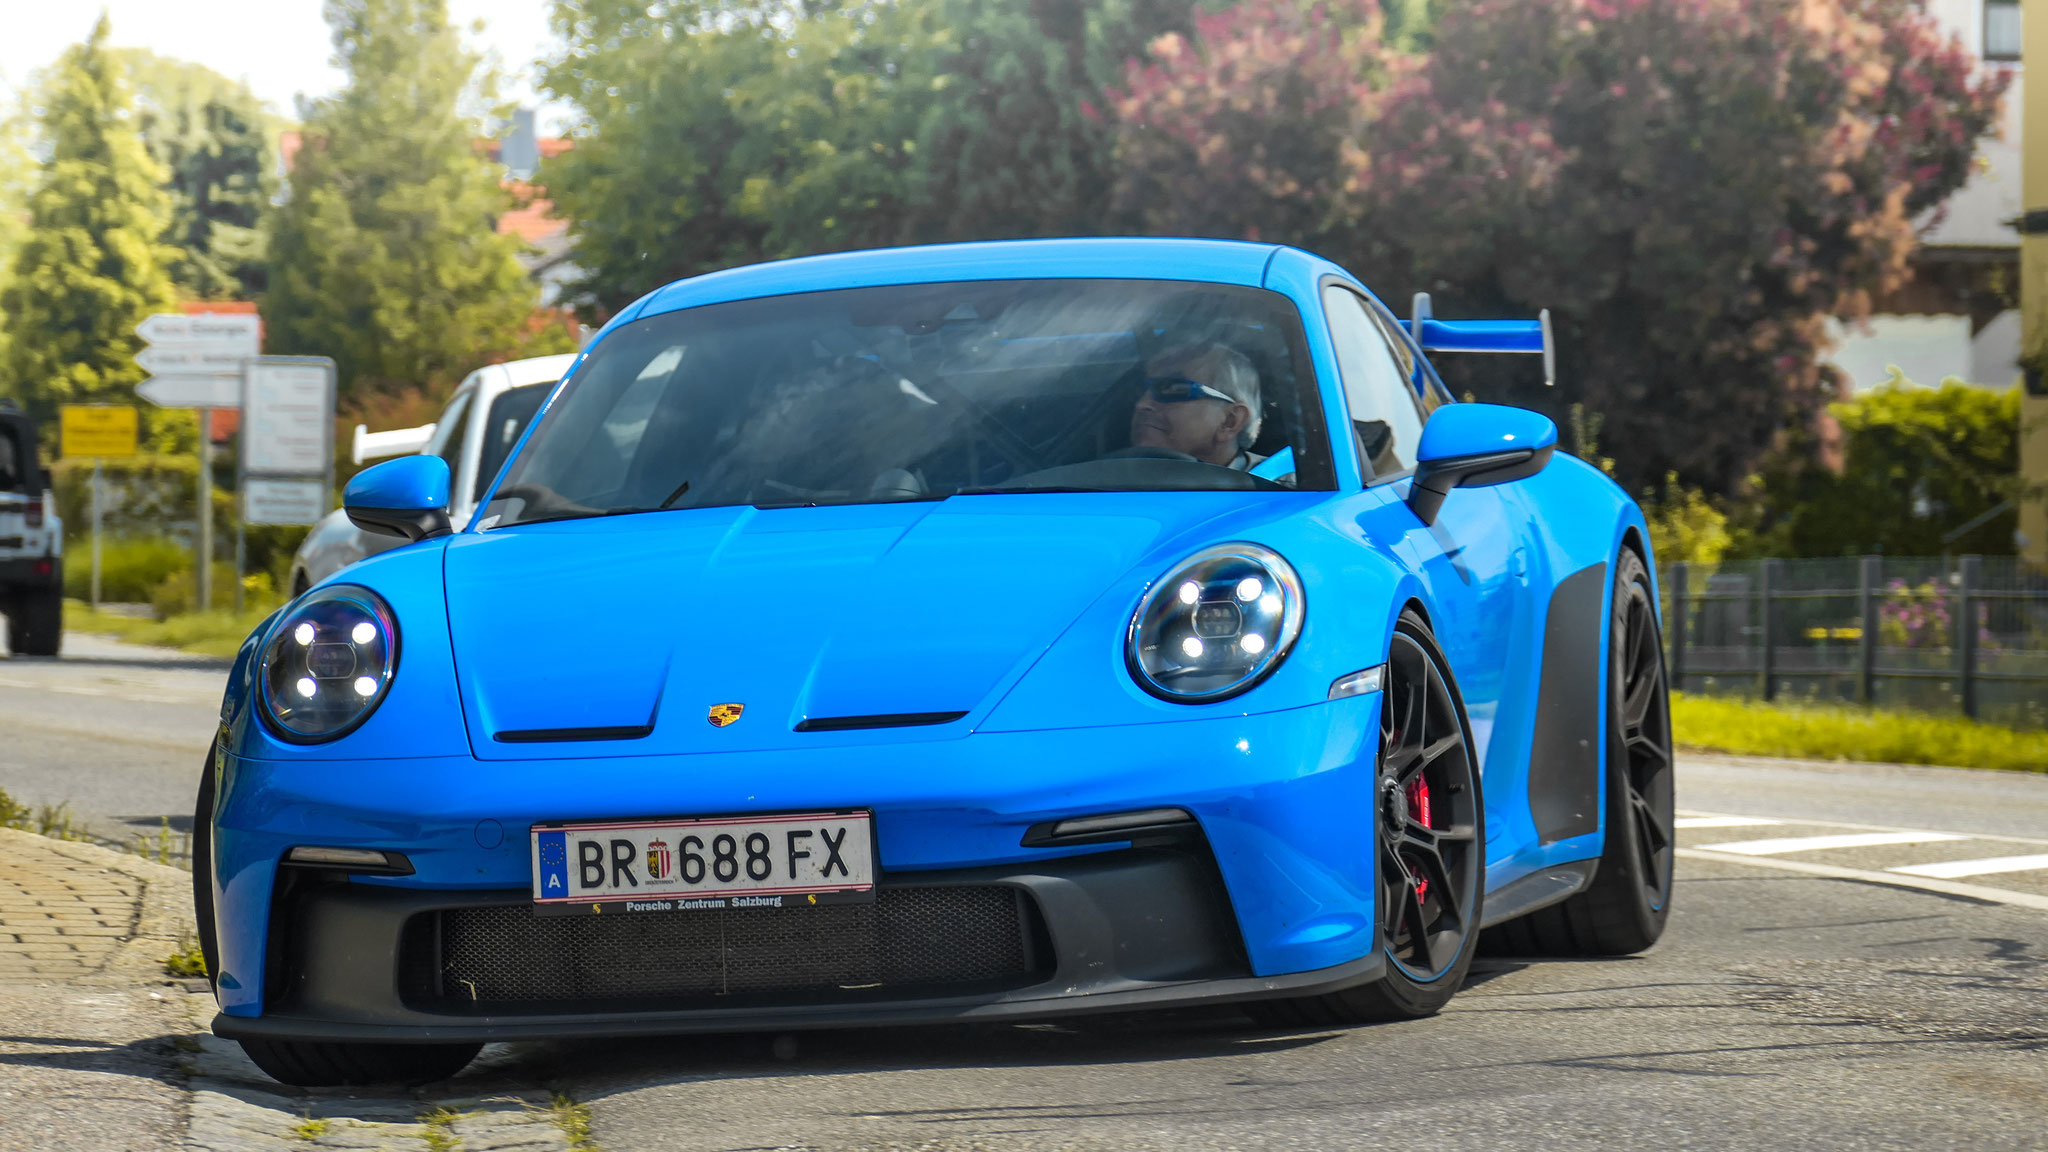 Porsche 992 GT3 - BR-688-FX (AUT)